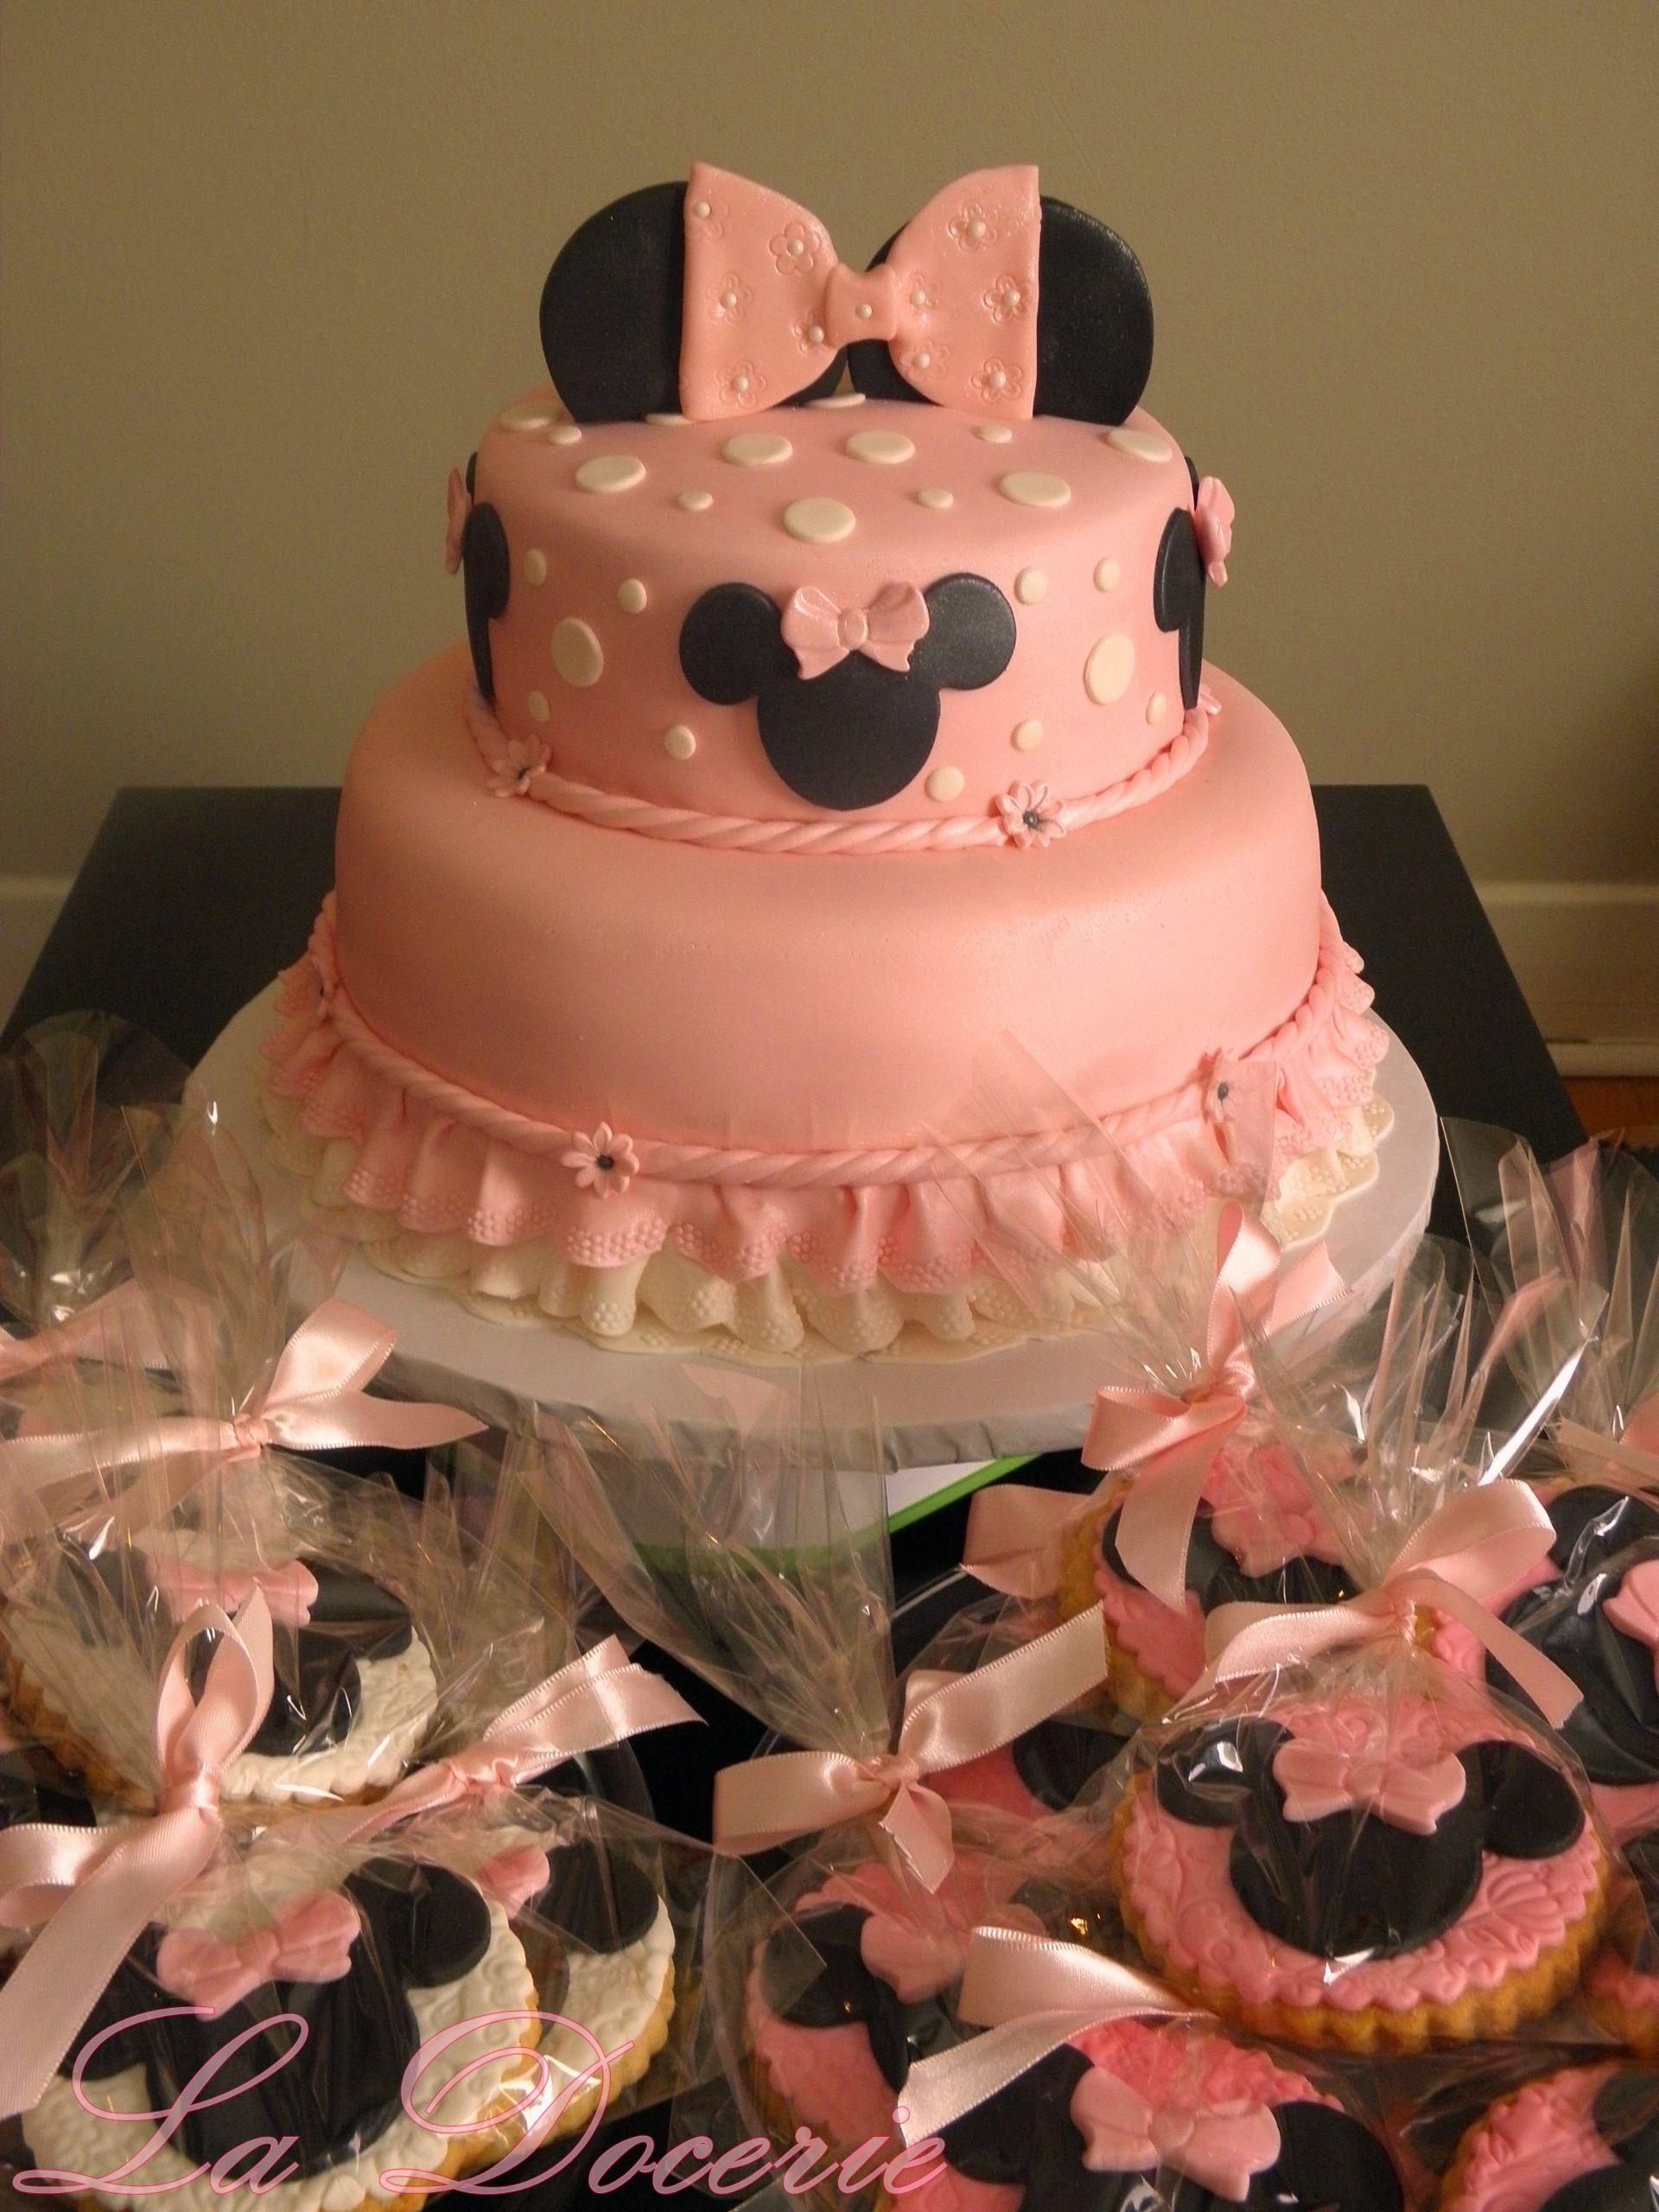 #bolominnie #biscoitosminnie #minnie'scake #gateauminnie